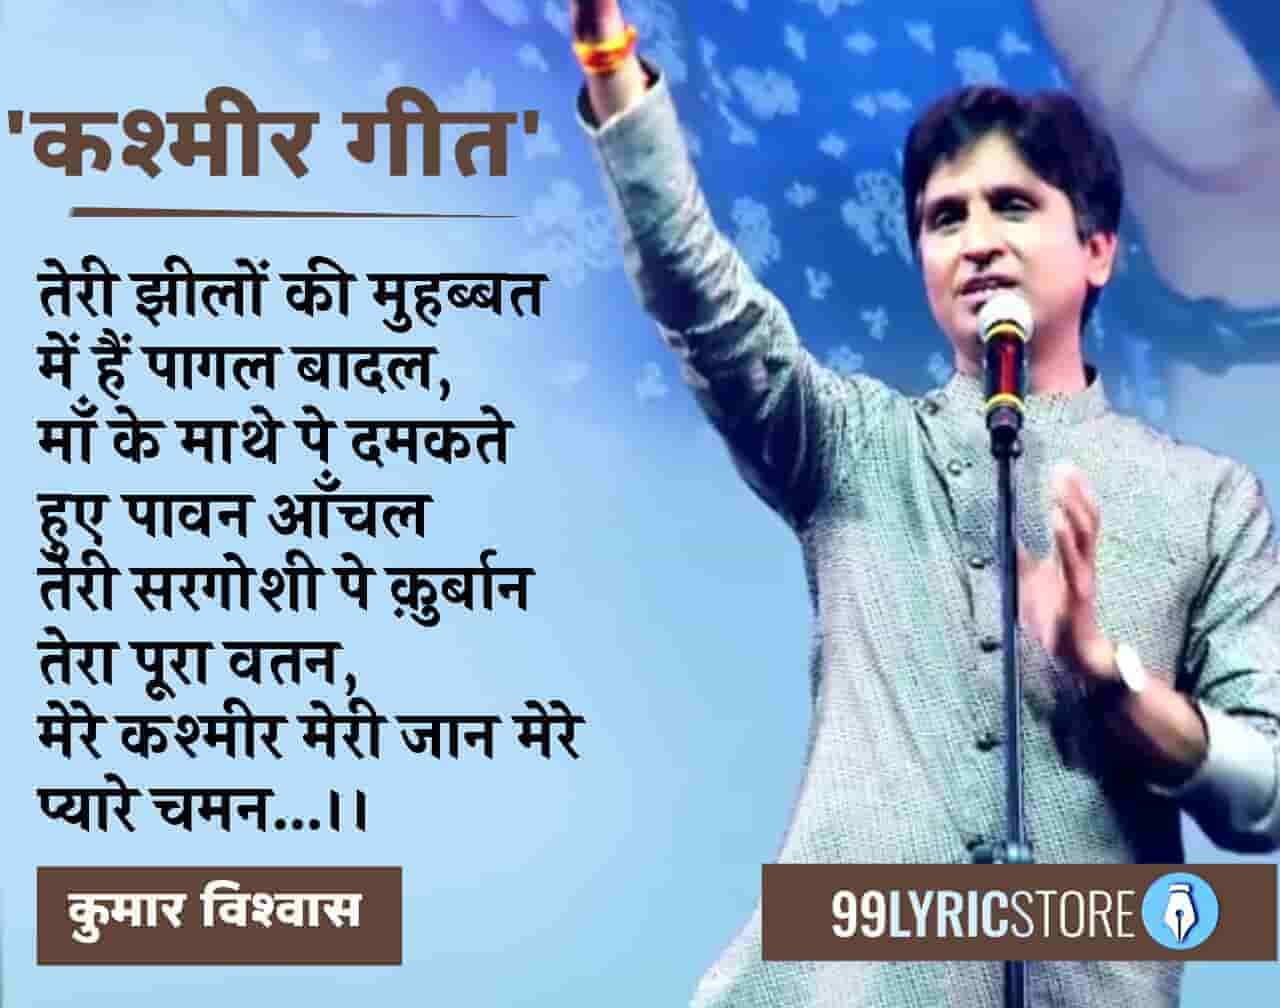 This beautiful Song 'Muhabbat ka Paigaam Kashmir ke Naam' has written and performed by Kumar Vishwas.